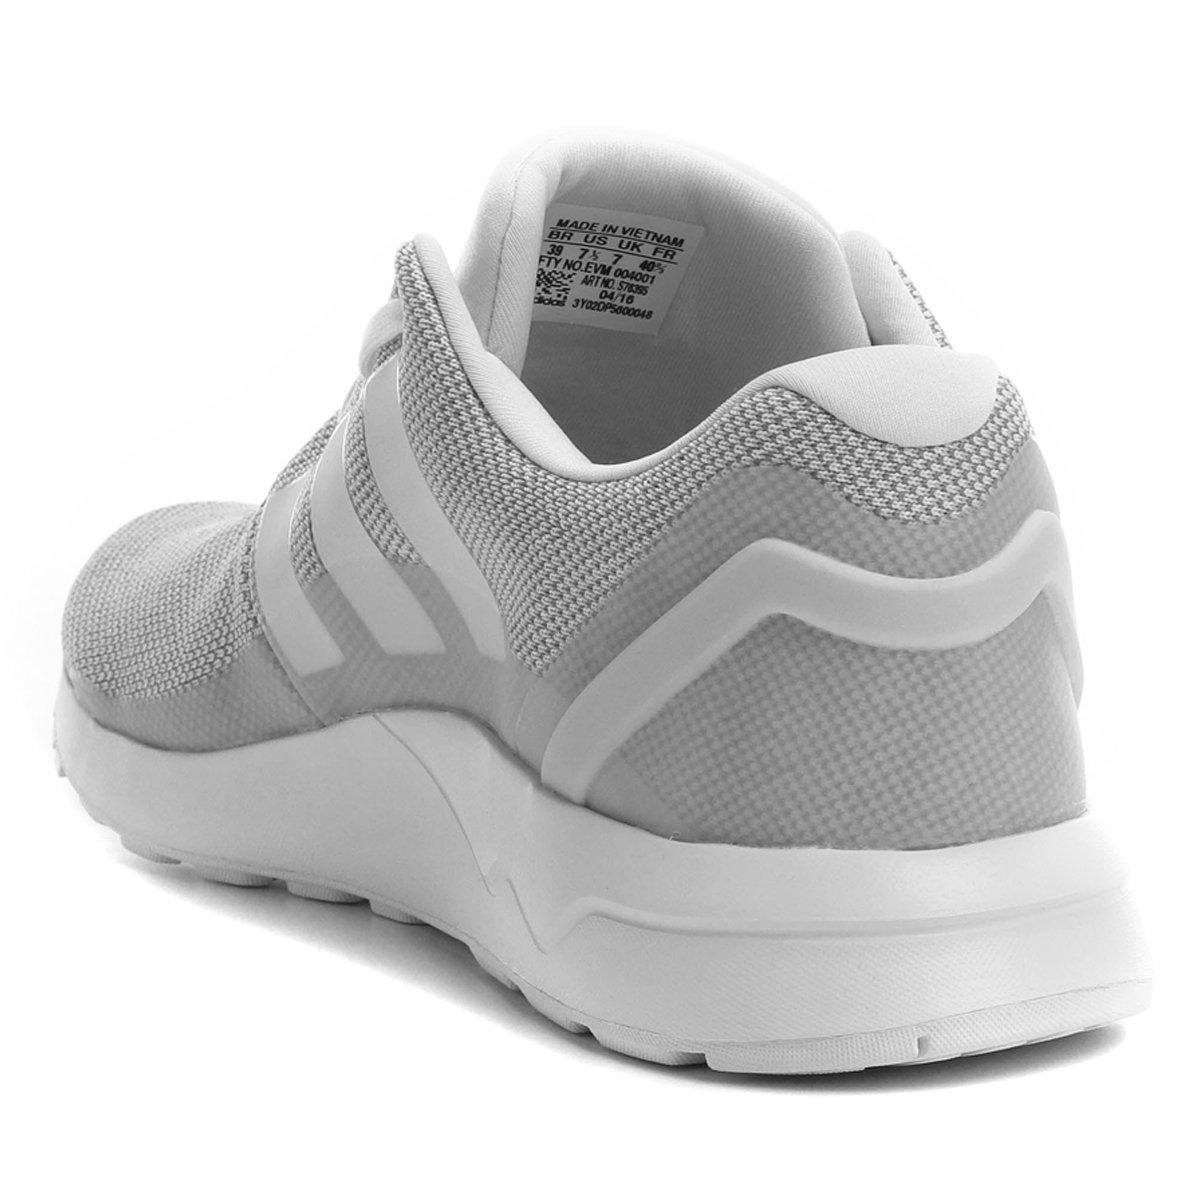 Tênis Adidas Zx Flux Adv Racer Tech - Compre Agora  dcc818c13ee7b